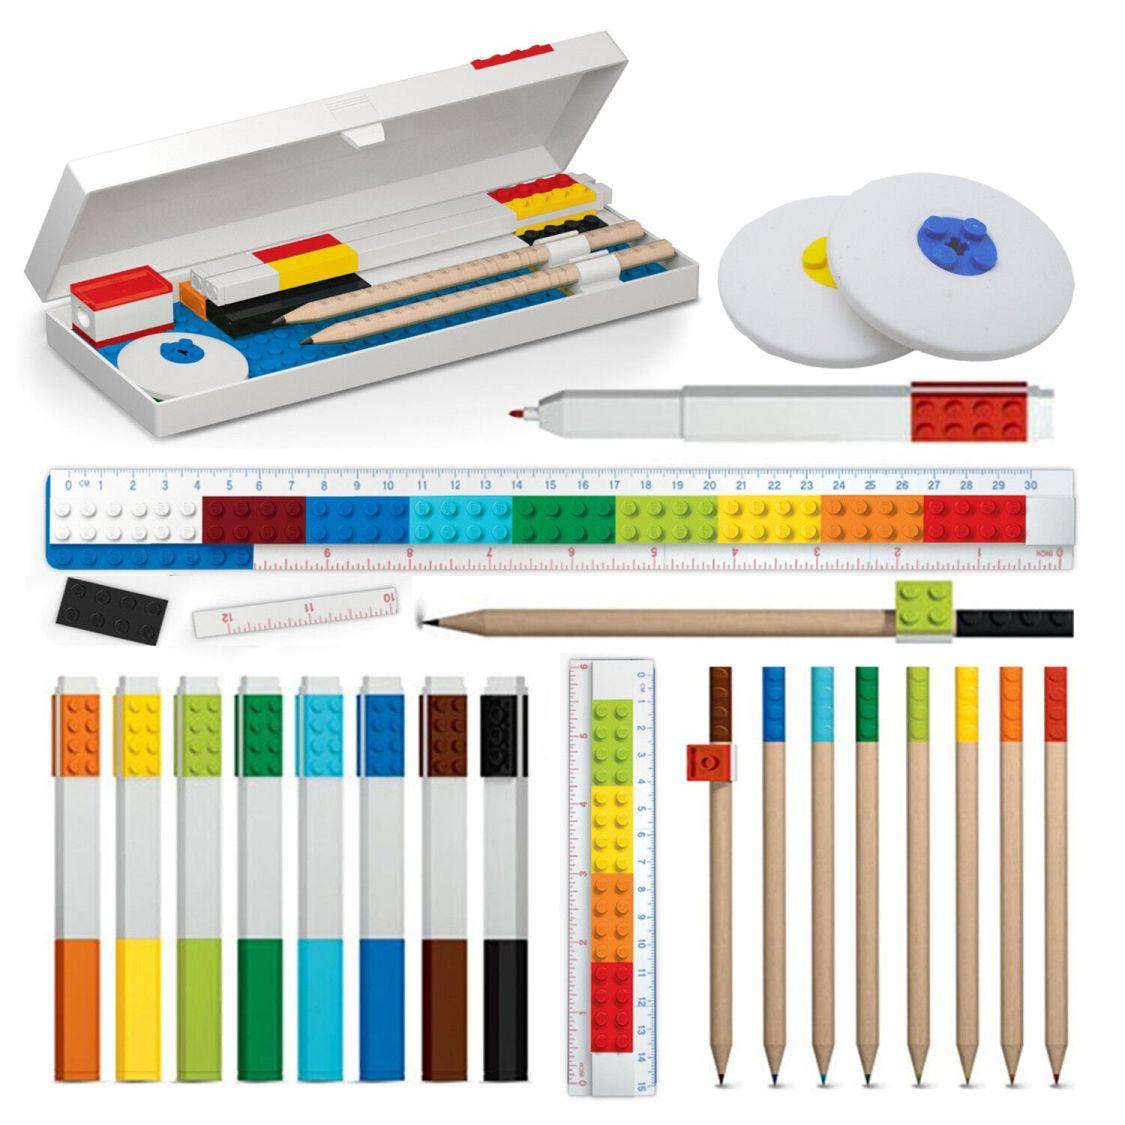 Schule Büro Kugelschreiber Stift Schreibwaren Schulbedarf Kinder Geschenk LEGO